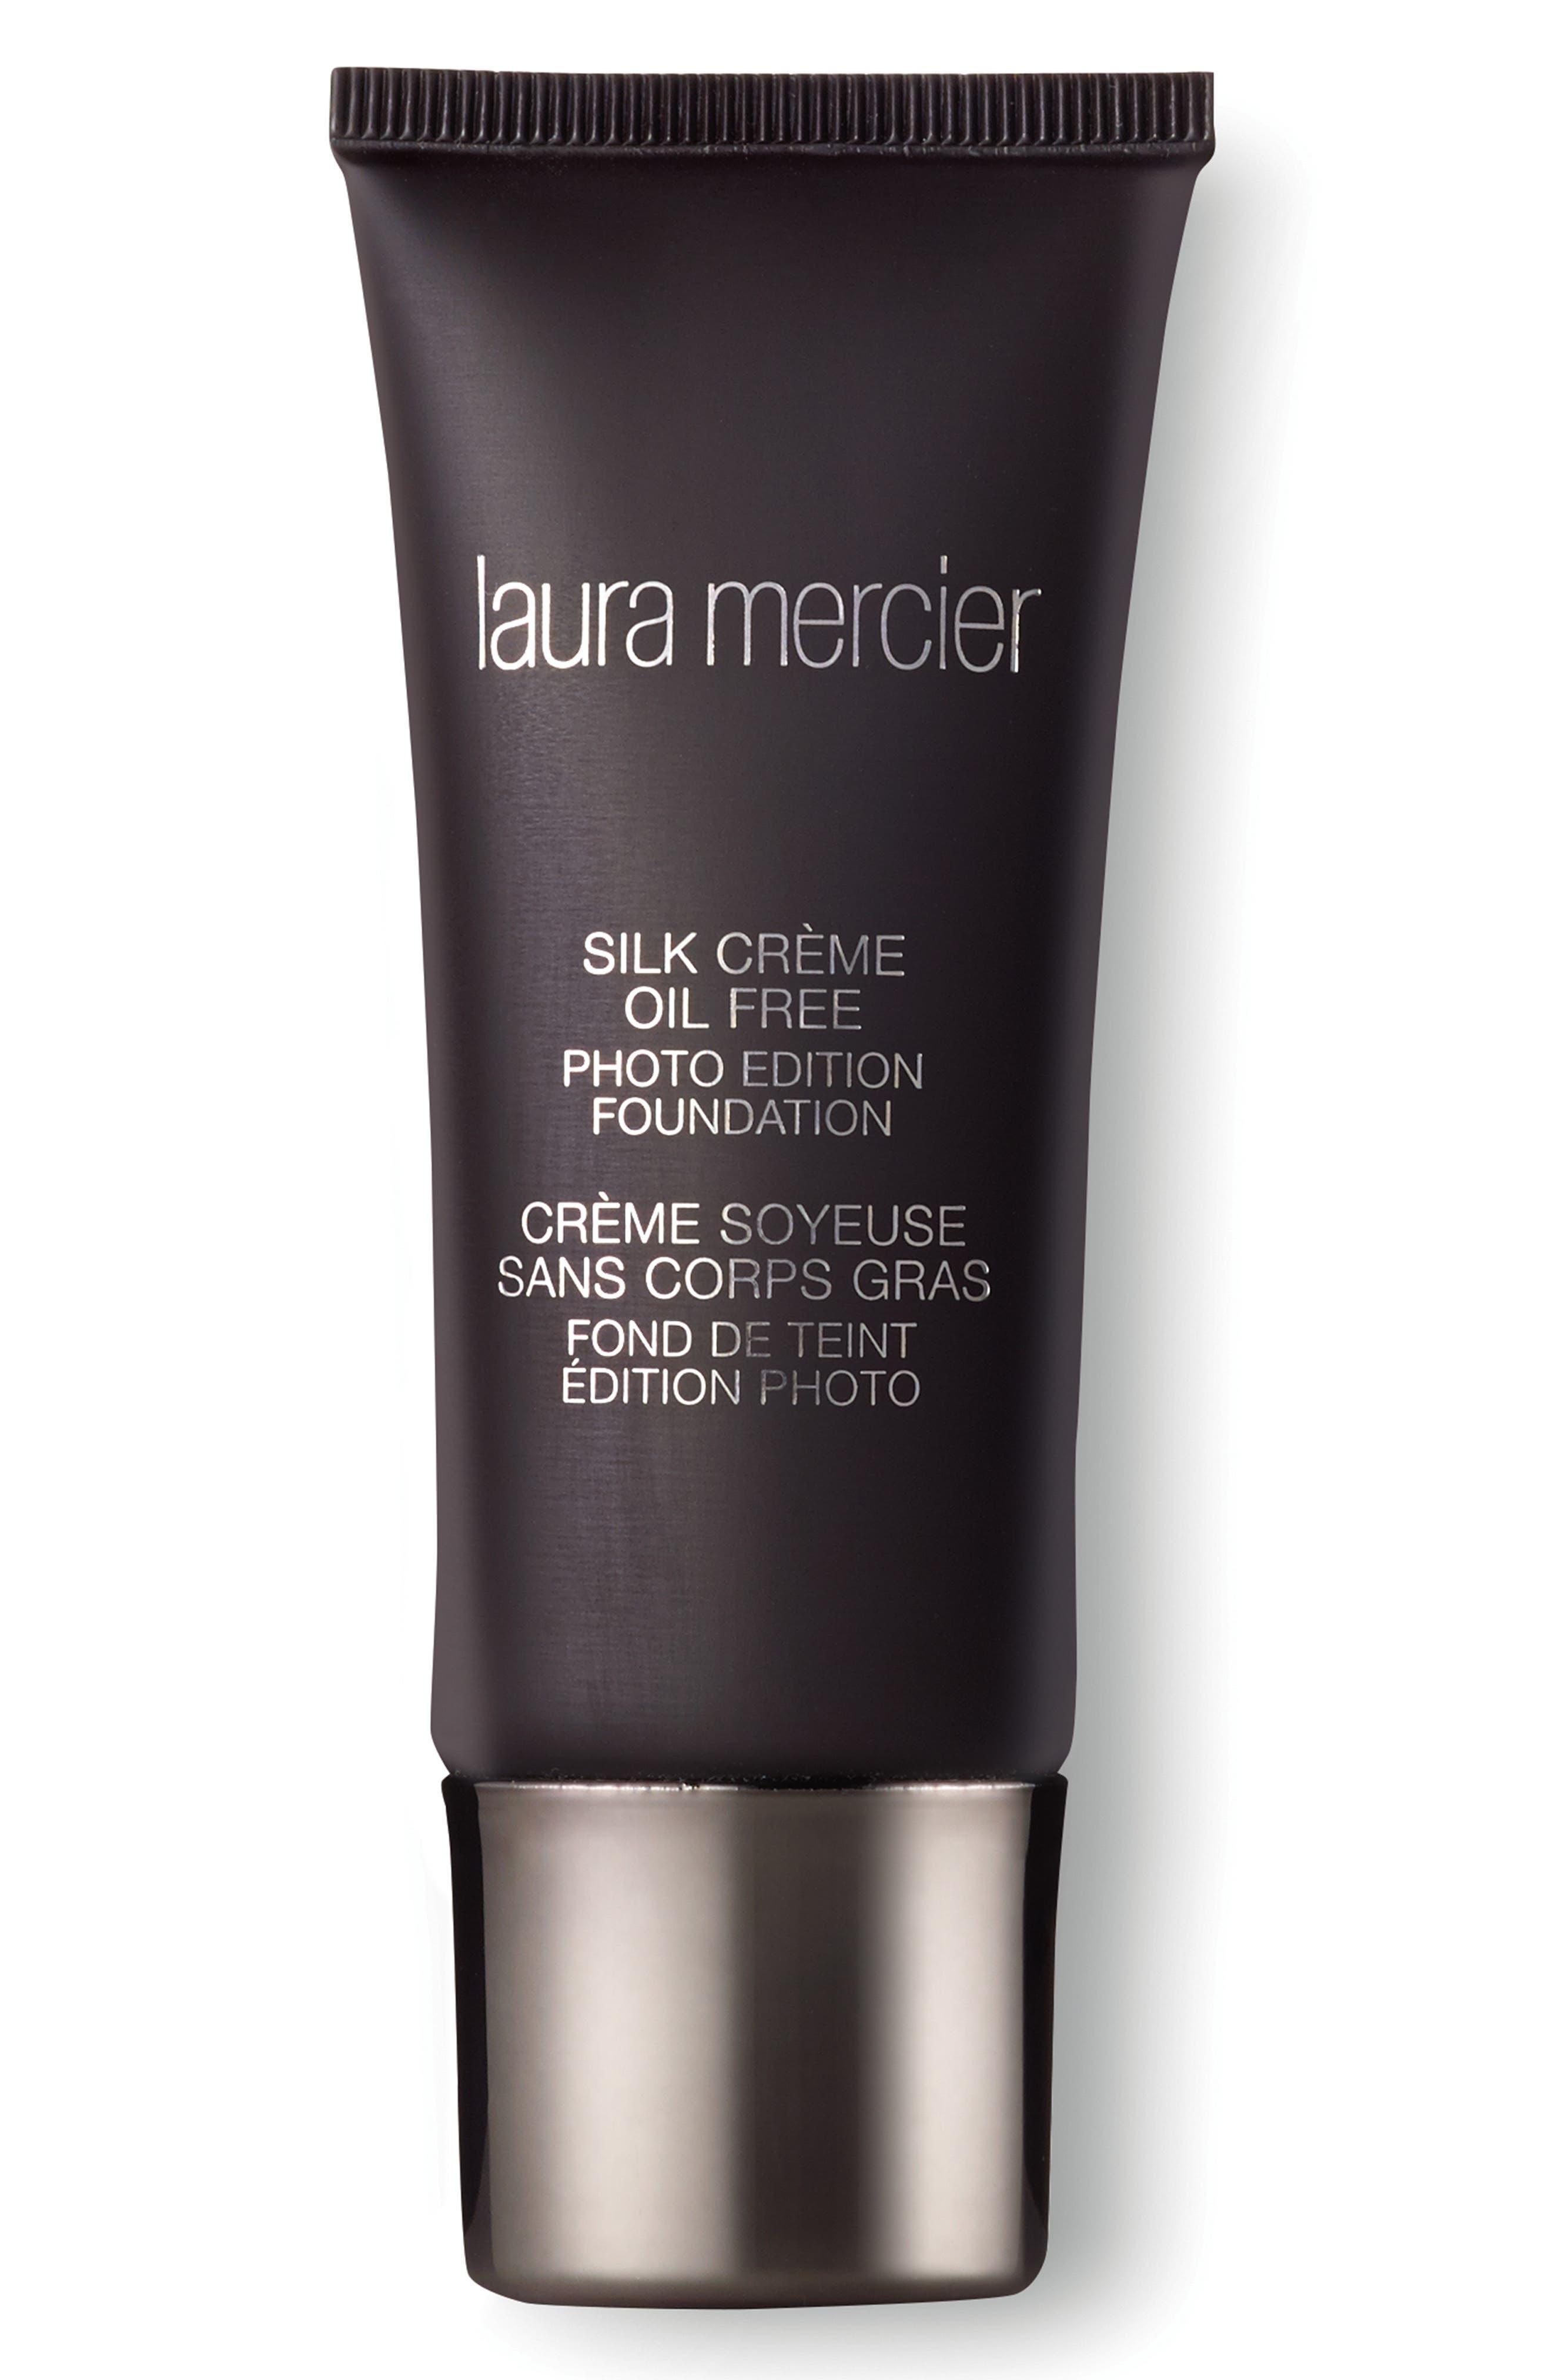 LAURA MERCIER, Silk Crème Oil-Free Photo Edition Foundation, Main thumbnail 1, color, SUNTAN